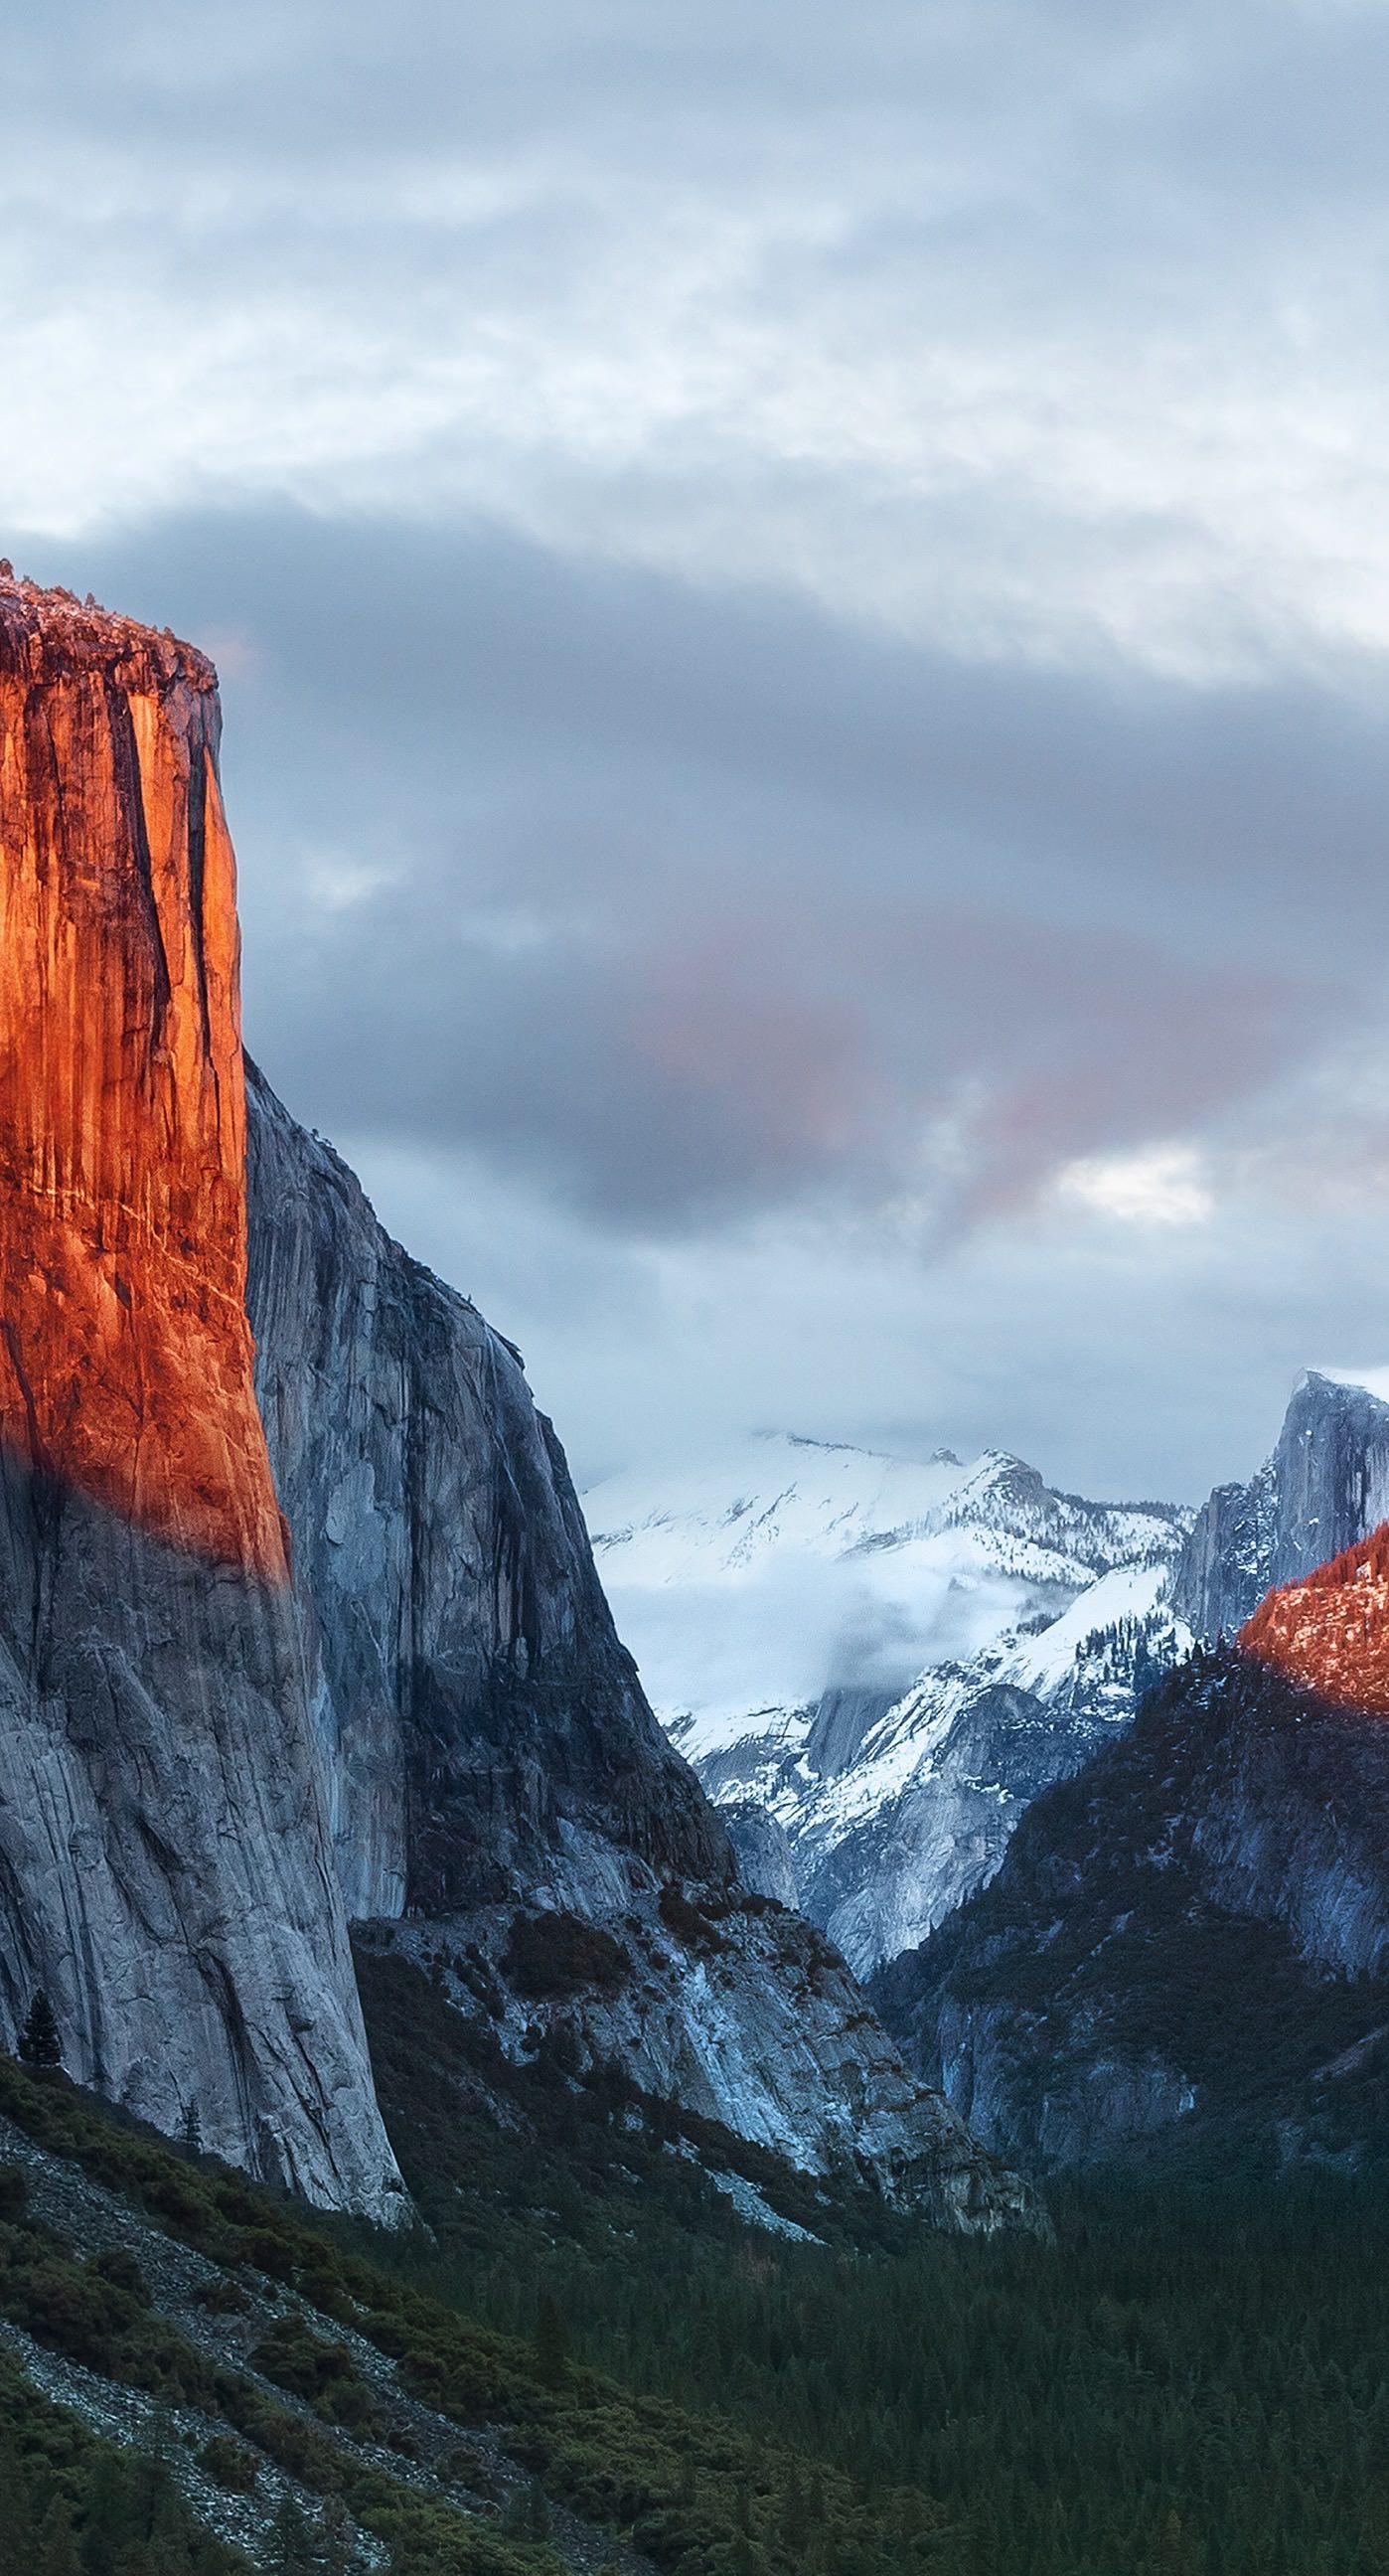 Landscape mountain El Capitan | wallpaper.sc iPhone6sPlus